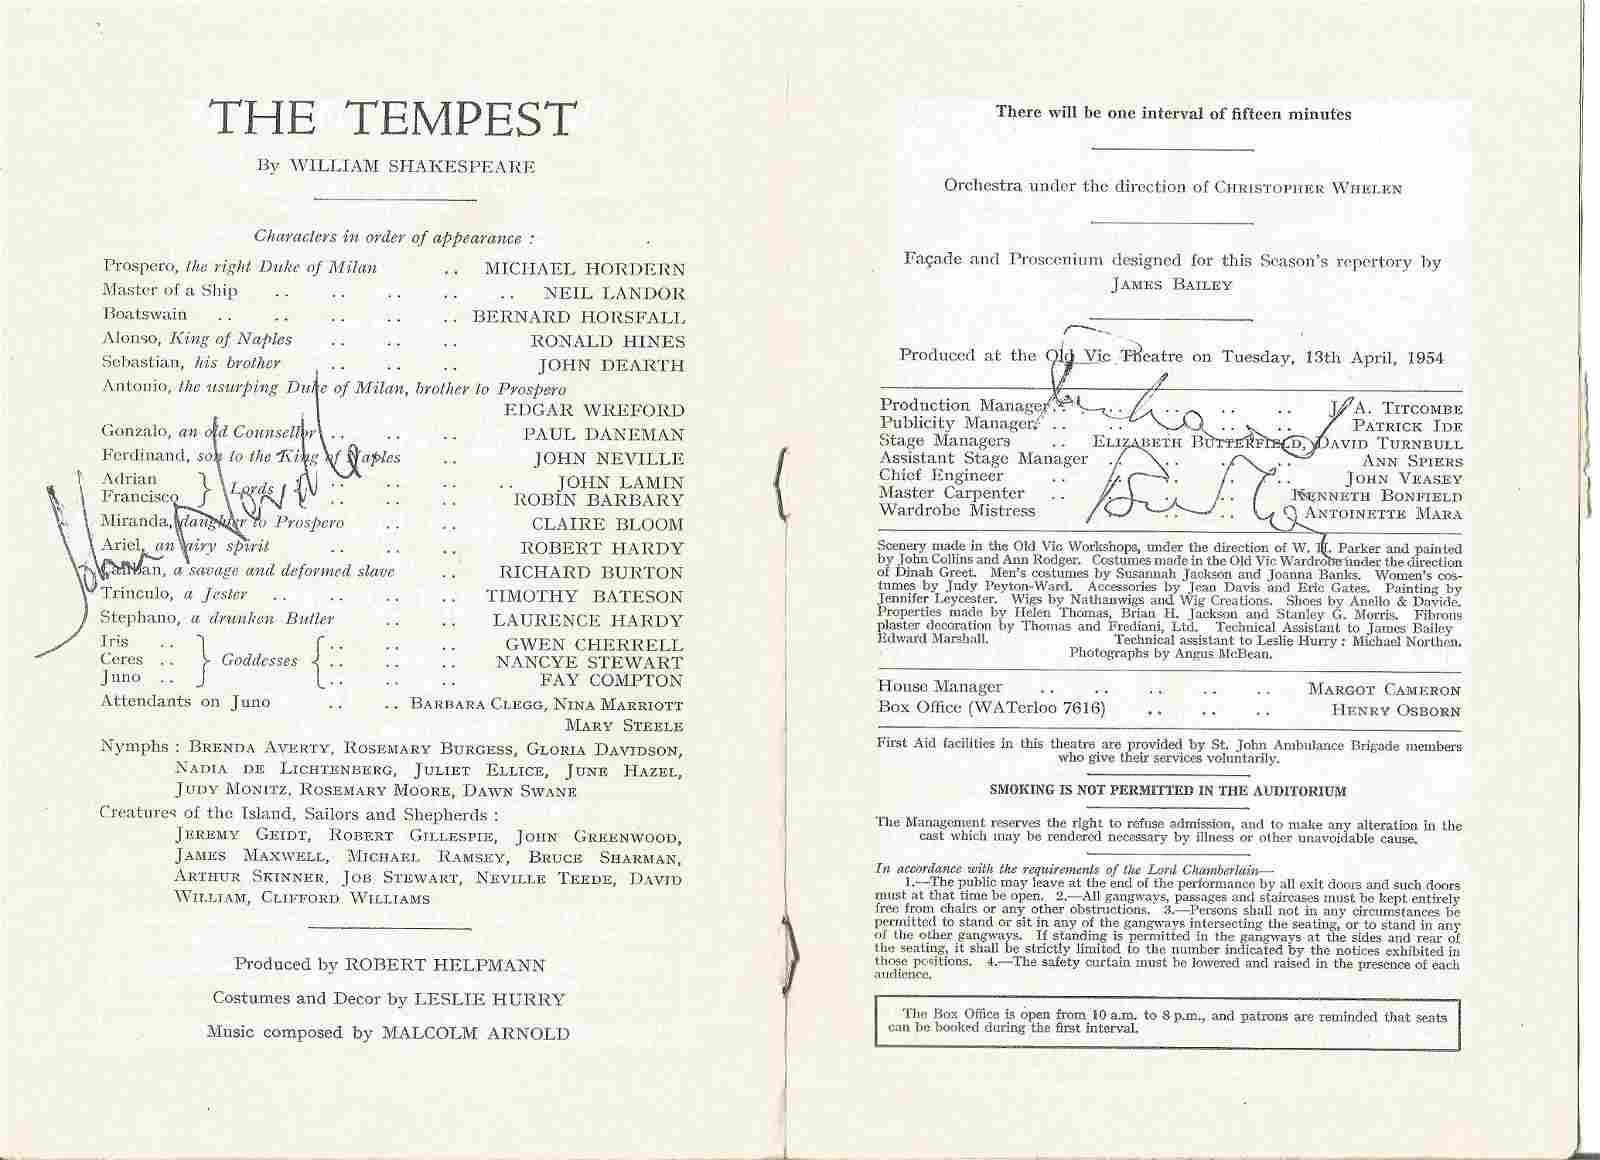 Richard Burton signed cast page of vintage theatre